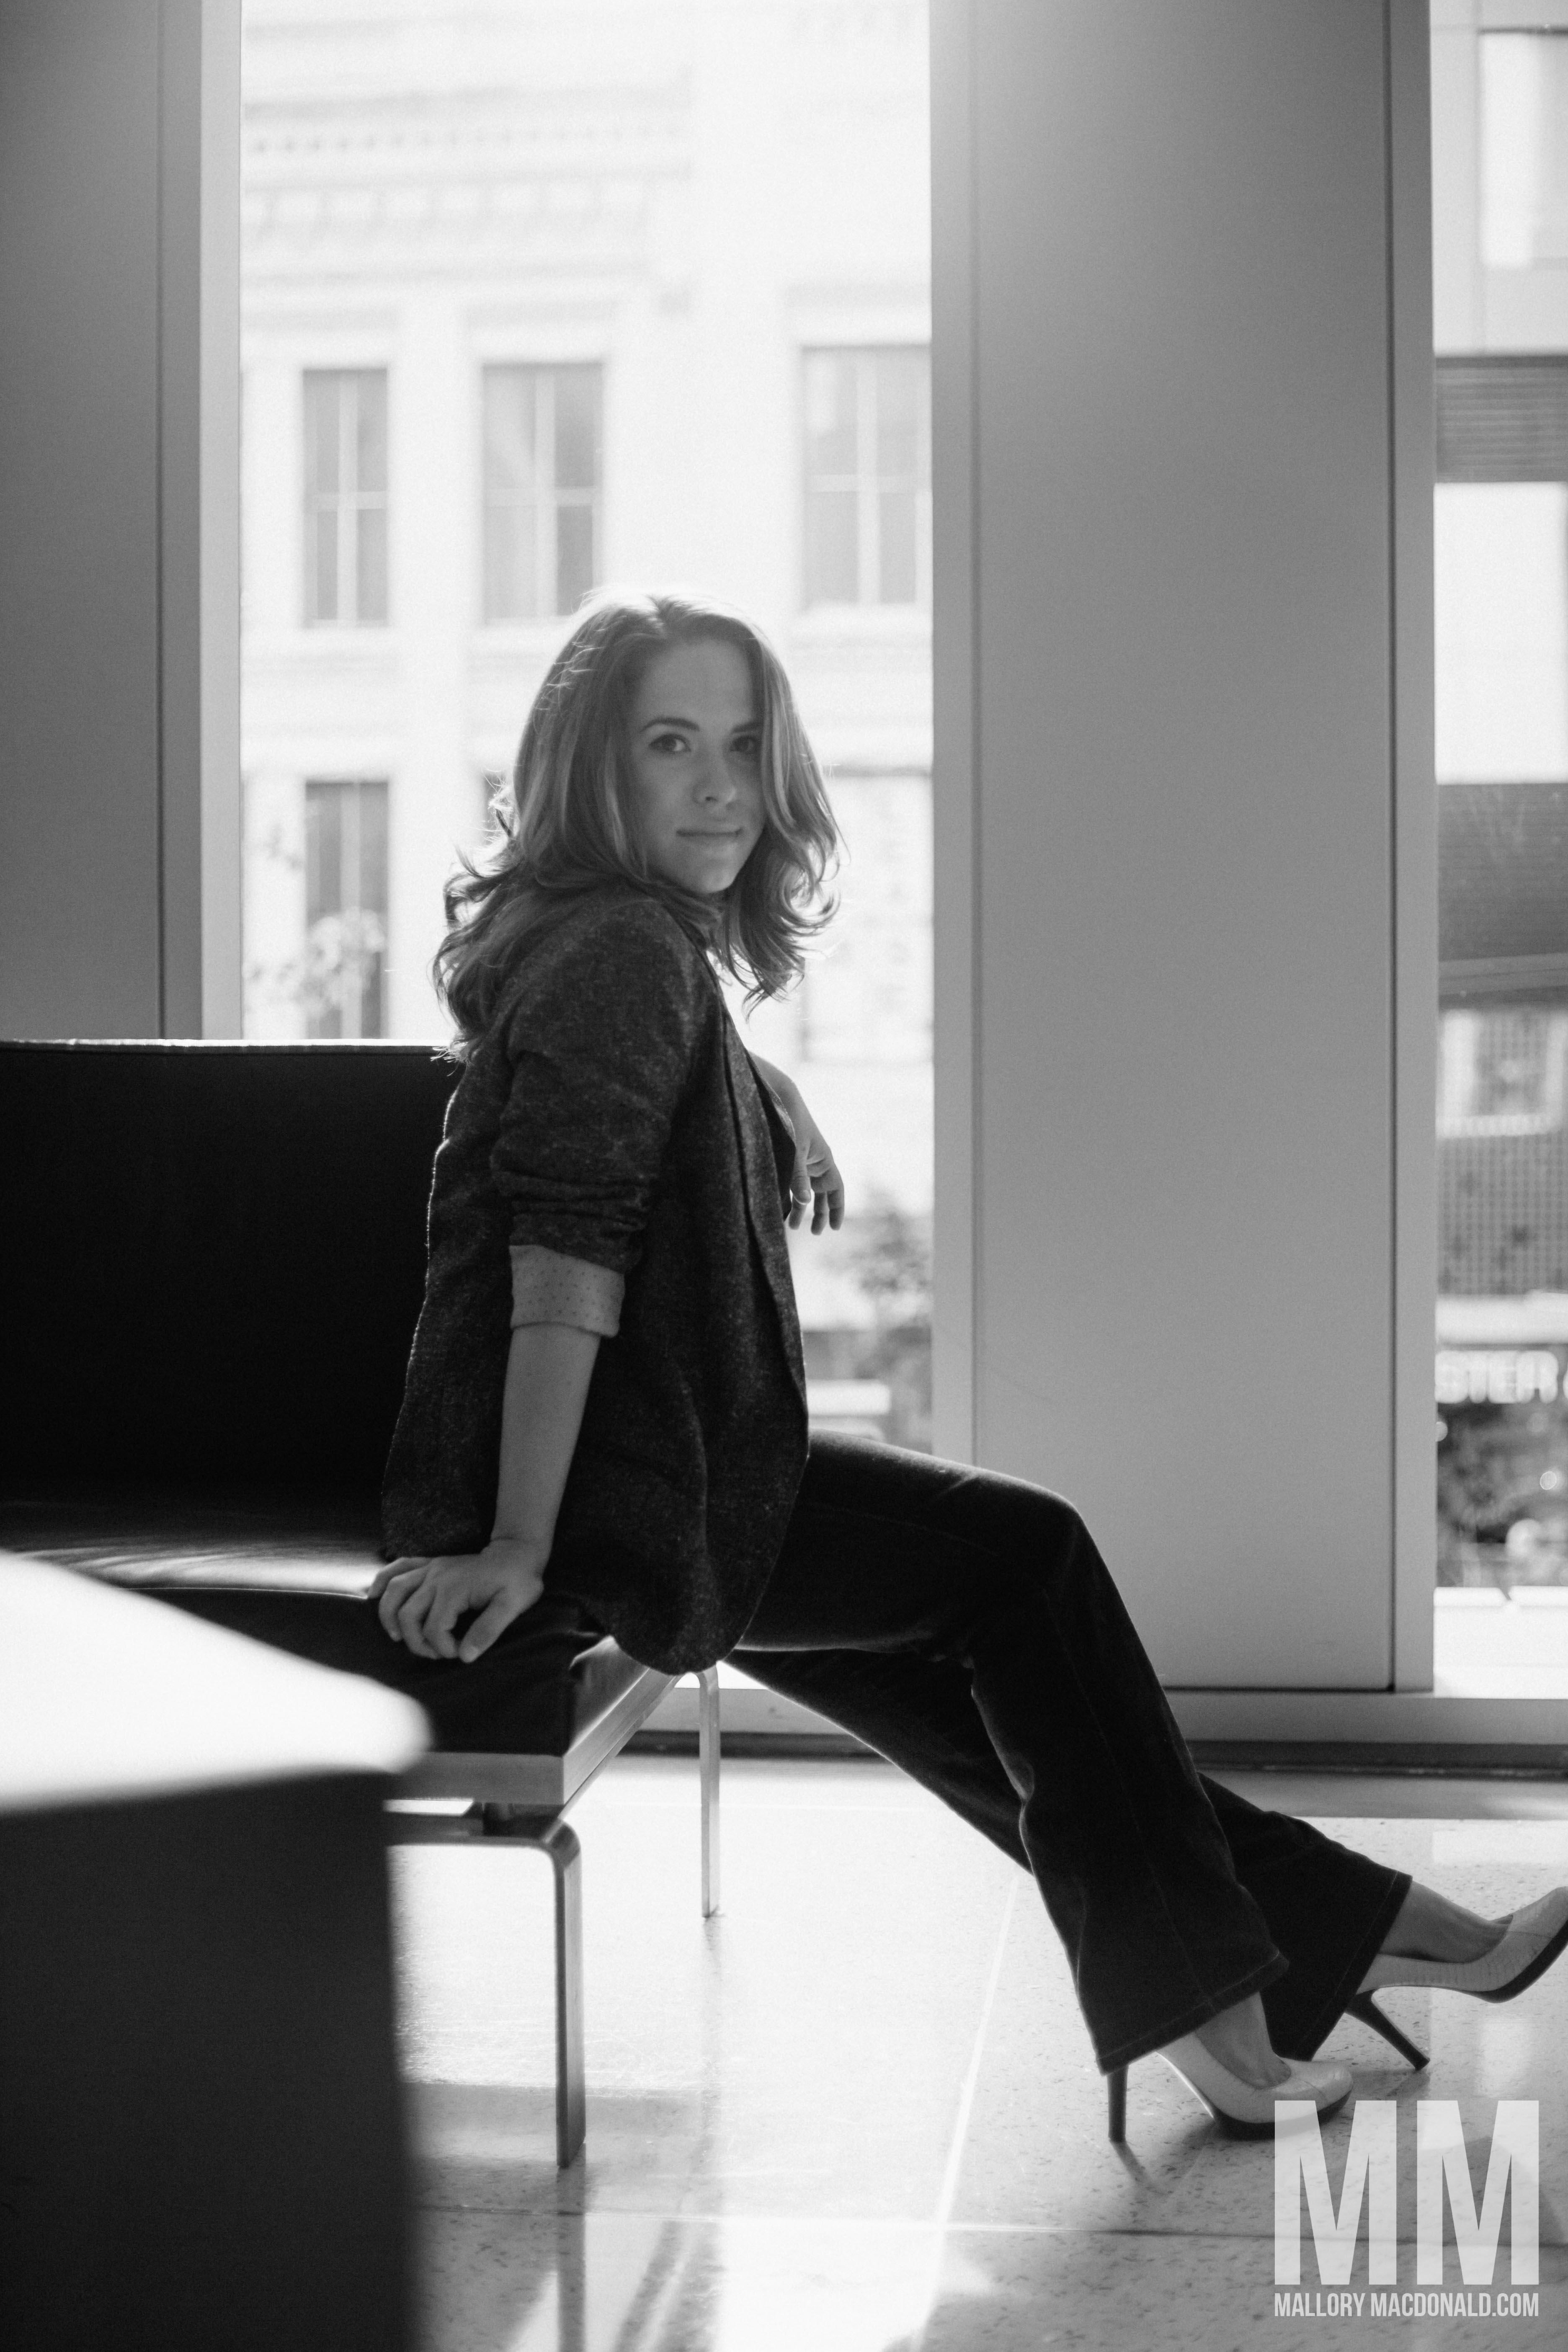 Becky-seattle-rb spa studio-storyville coffee-photo shoot-mallory macdonald-8119